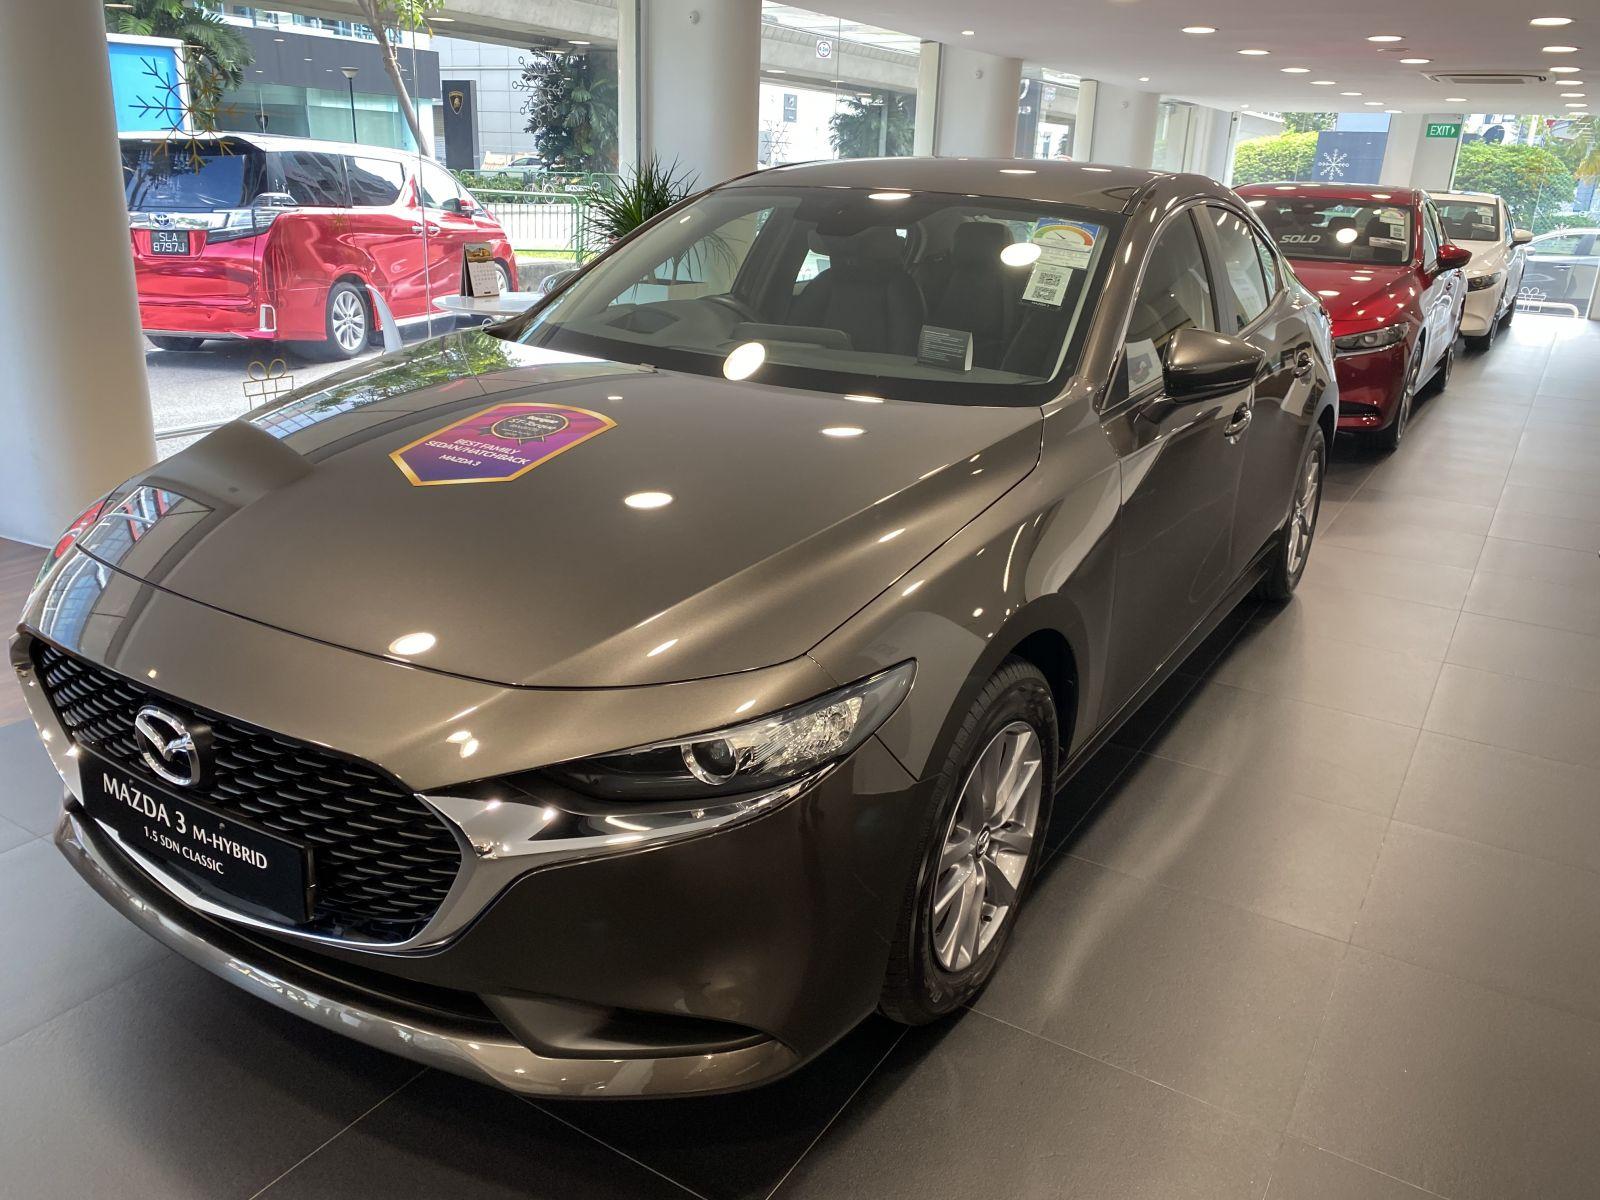 Mazda 3 Mild Hybrid 1.5A Brand New (For Lease)